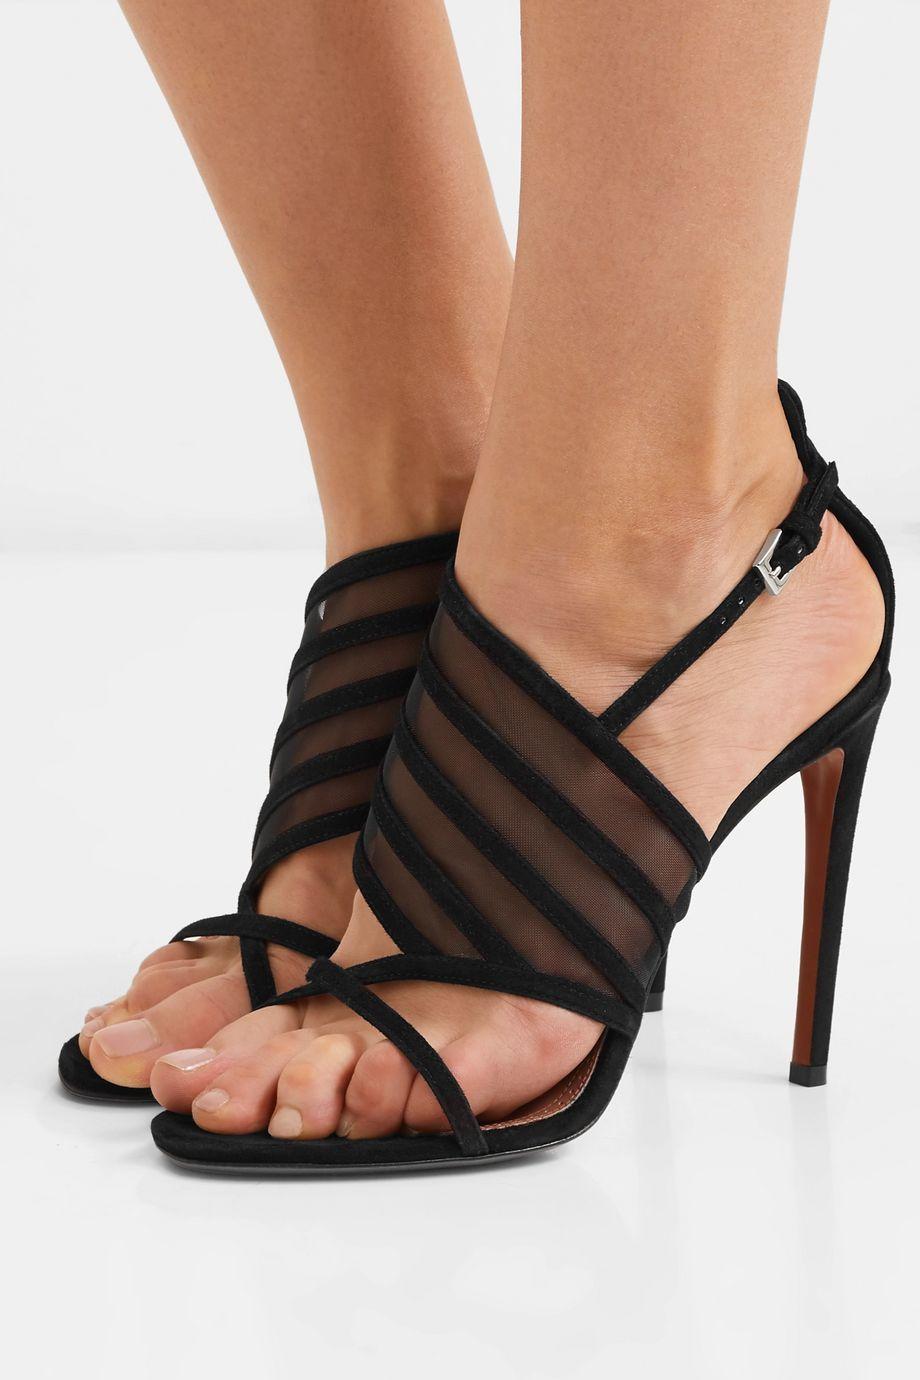 Alaïa 110 suede and mesh sandals